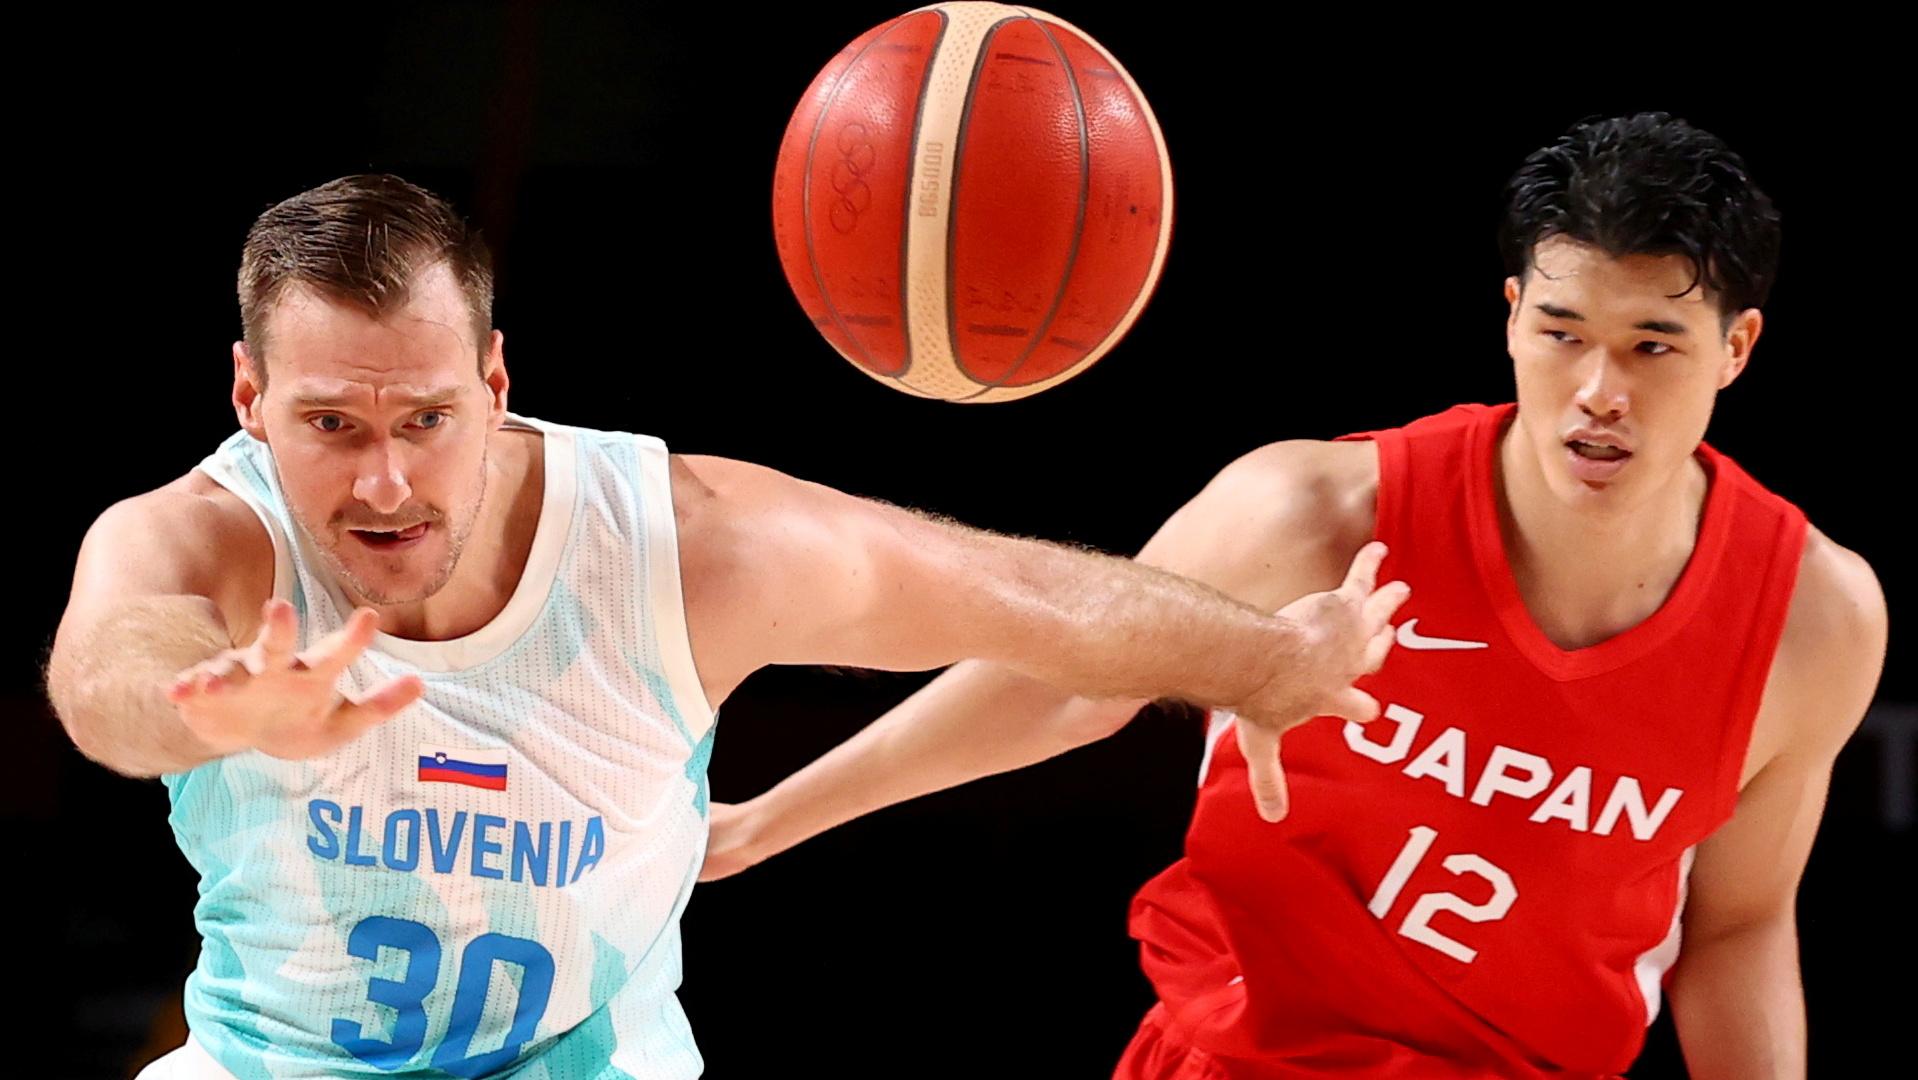 Tokyo 2020 Olympics - Basketball - Men - Group C - Slovenia v Japan - Saitama Super Arena, Saitama, Japan - July 29, 2021. Zoran Dragic of Slovenia in action with Y. Watanabe of Japan REUTERS/Alkis Konstantinidis